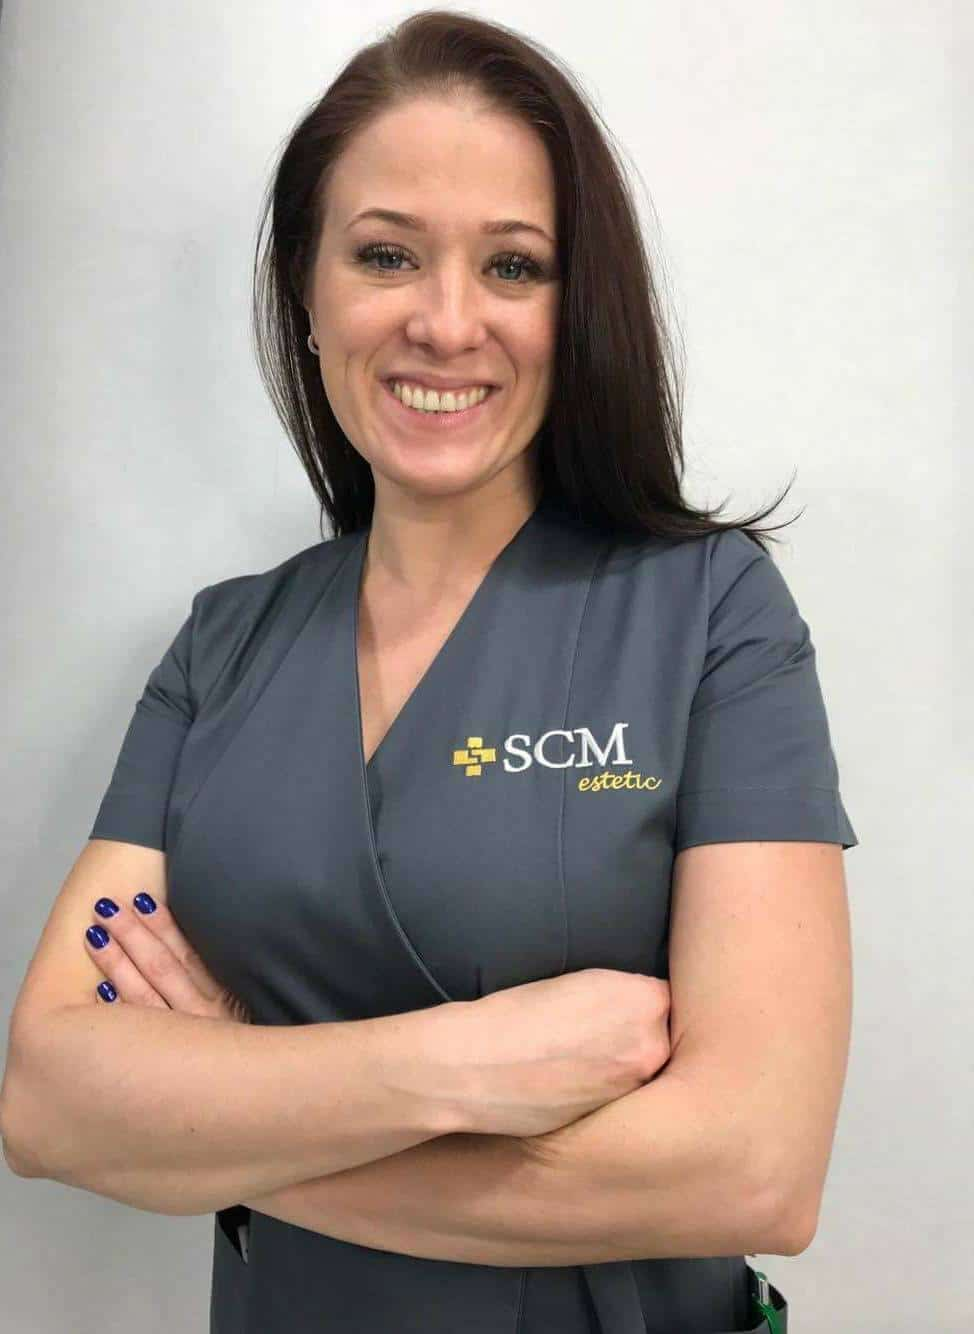 Dr Anna Aseńko - chirurg plastyczny w SCM clinic